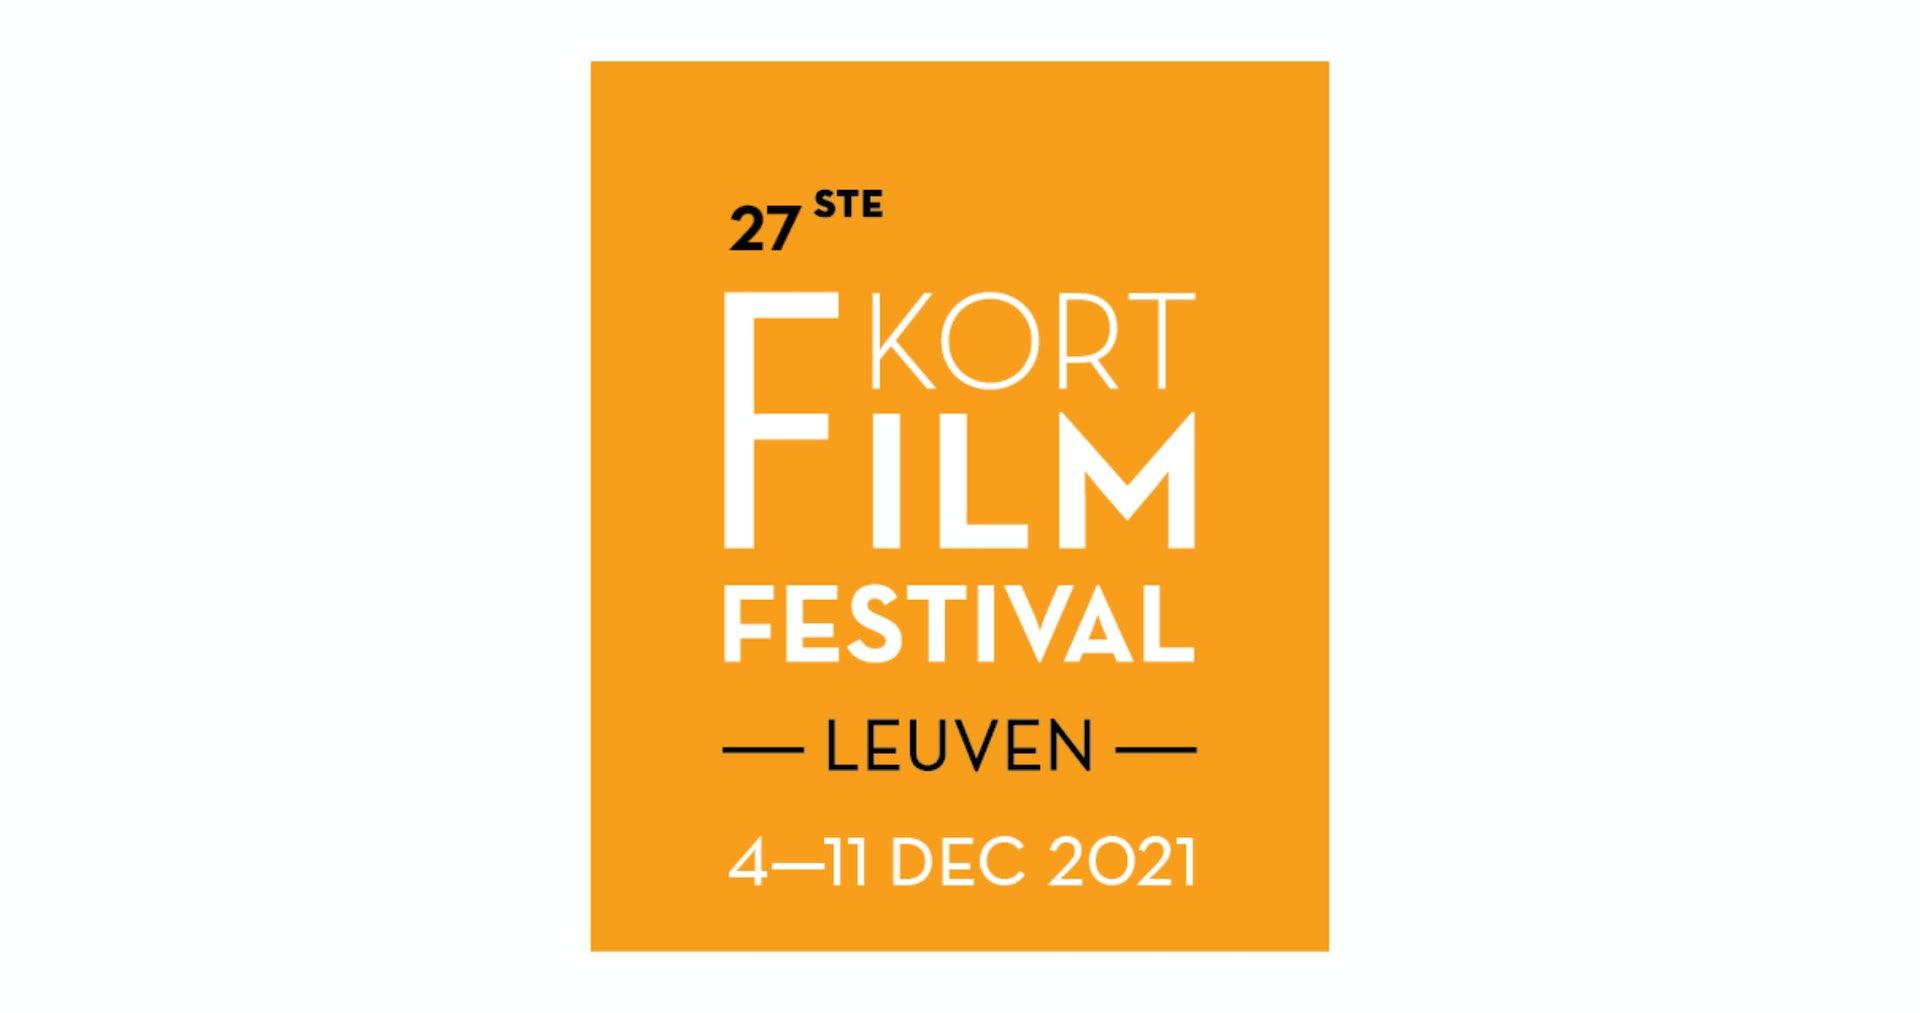 Kort Film festival leuven pitch